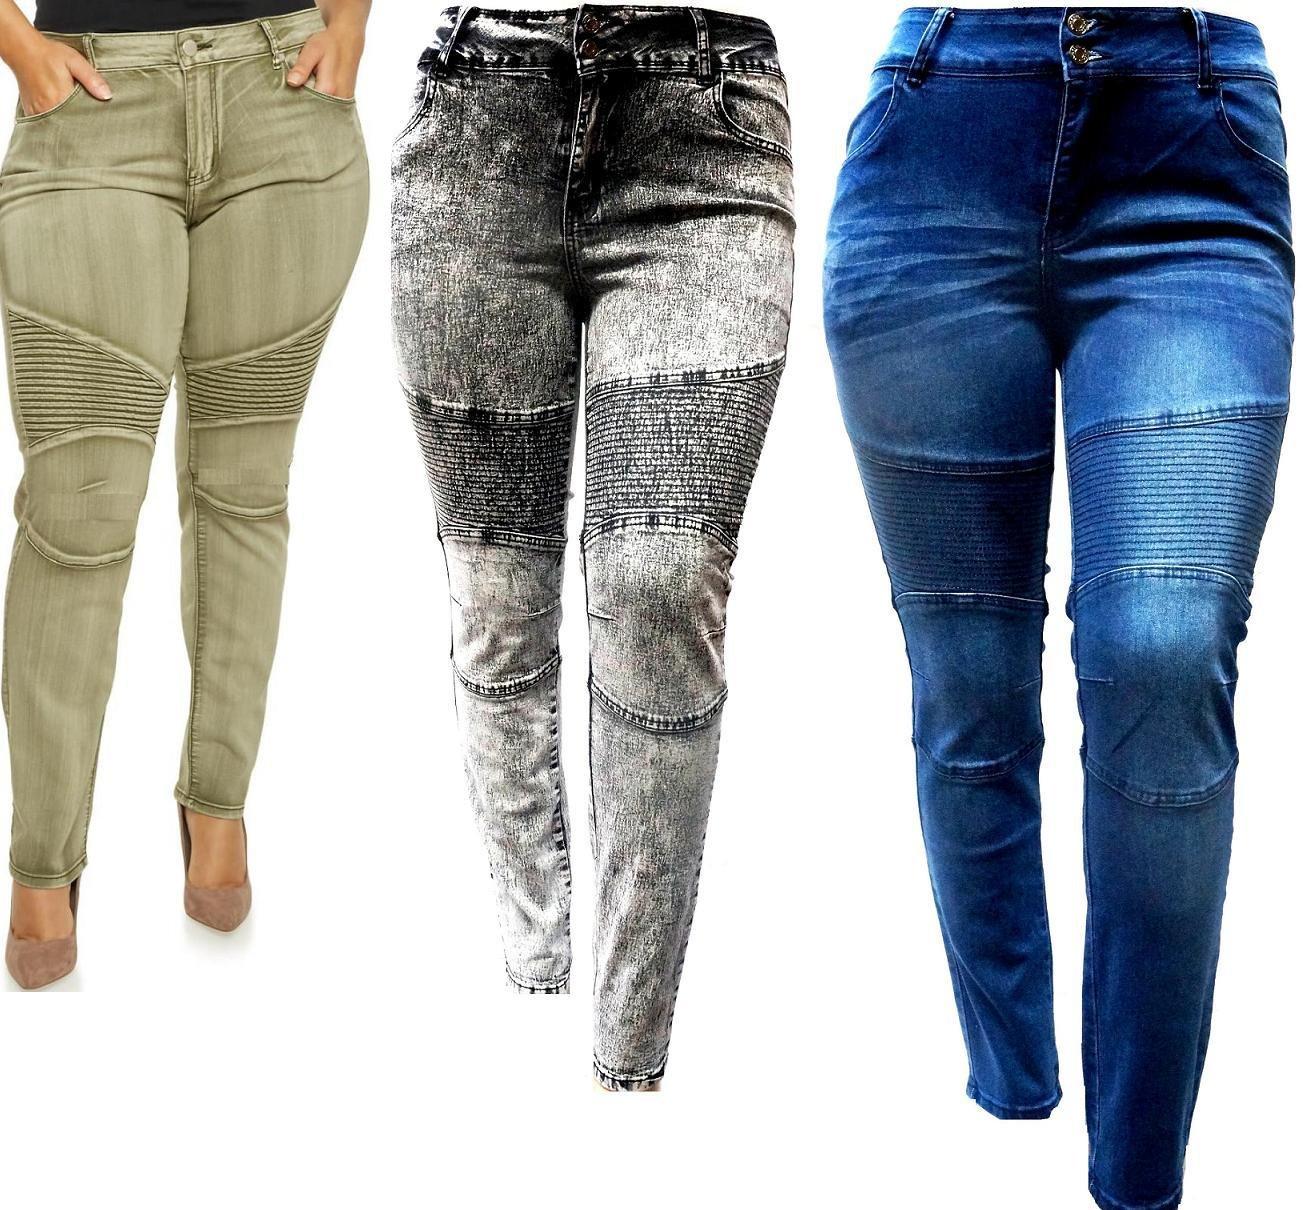 0f36a4f424d8a Jack david Women s Plus Size Moto Biker Stretch Skinny Denim Jeans ...